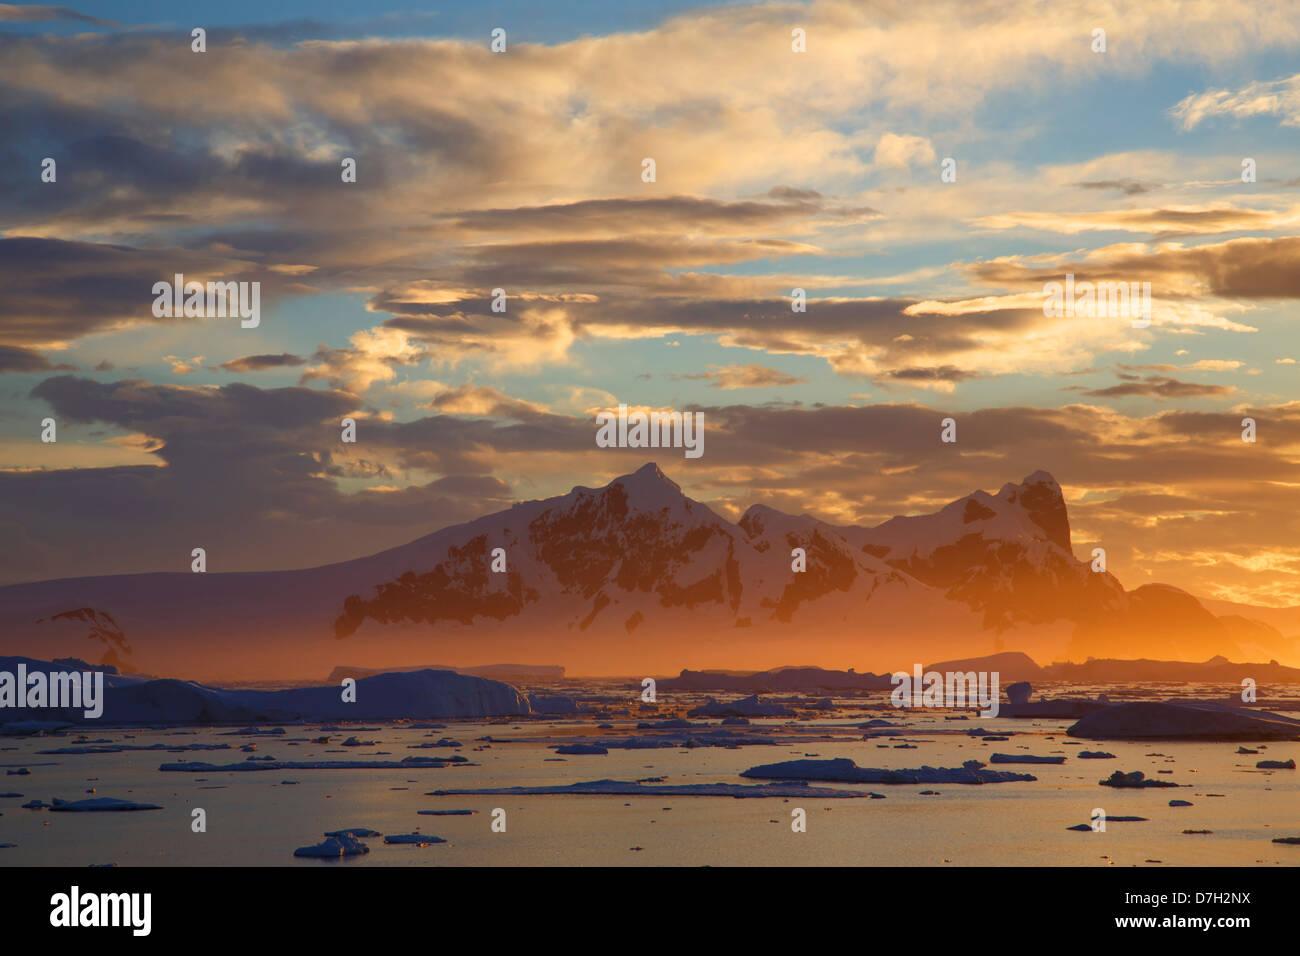 Sunset / Sunrise wie wir unterhalb des Polarkreises, Antarktis Reisen. Stockbild